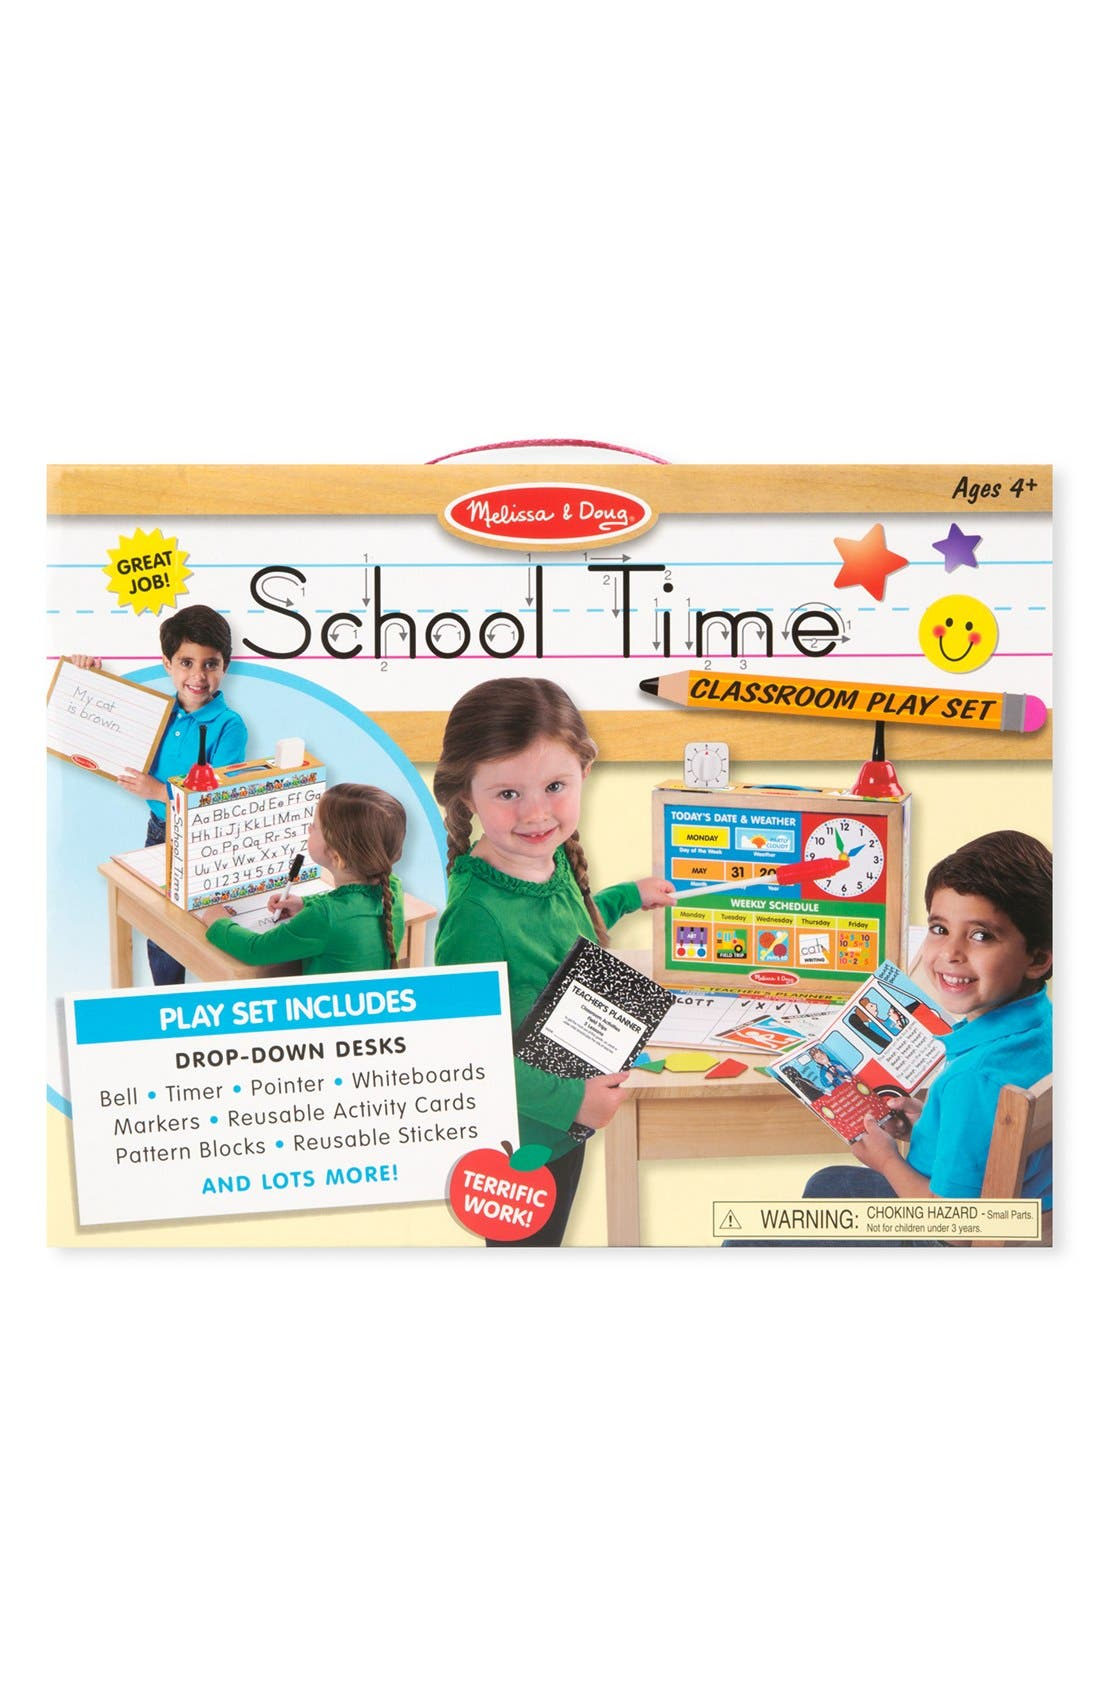 Alternate Image 1 Selected - Melissa & Doug 'School Time!' Classroom Play Set